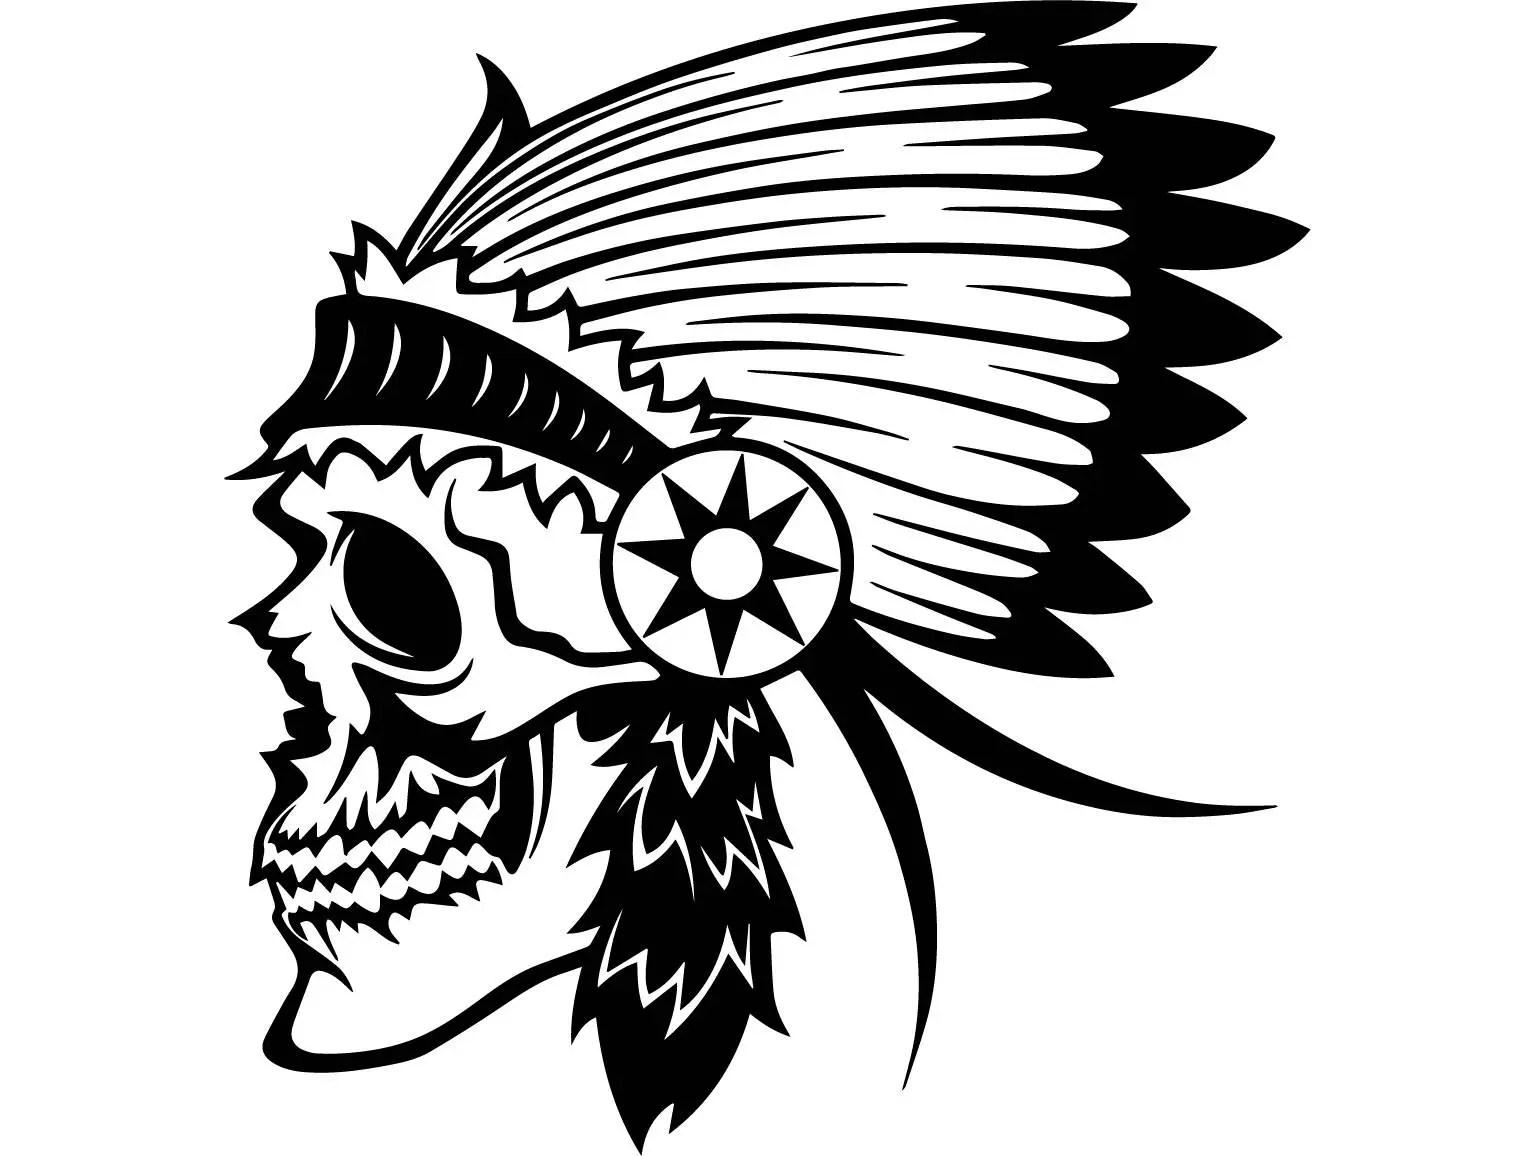 Indian Skull 2 Native American Warrior Headdress Feather